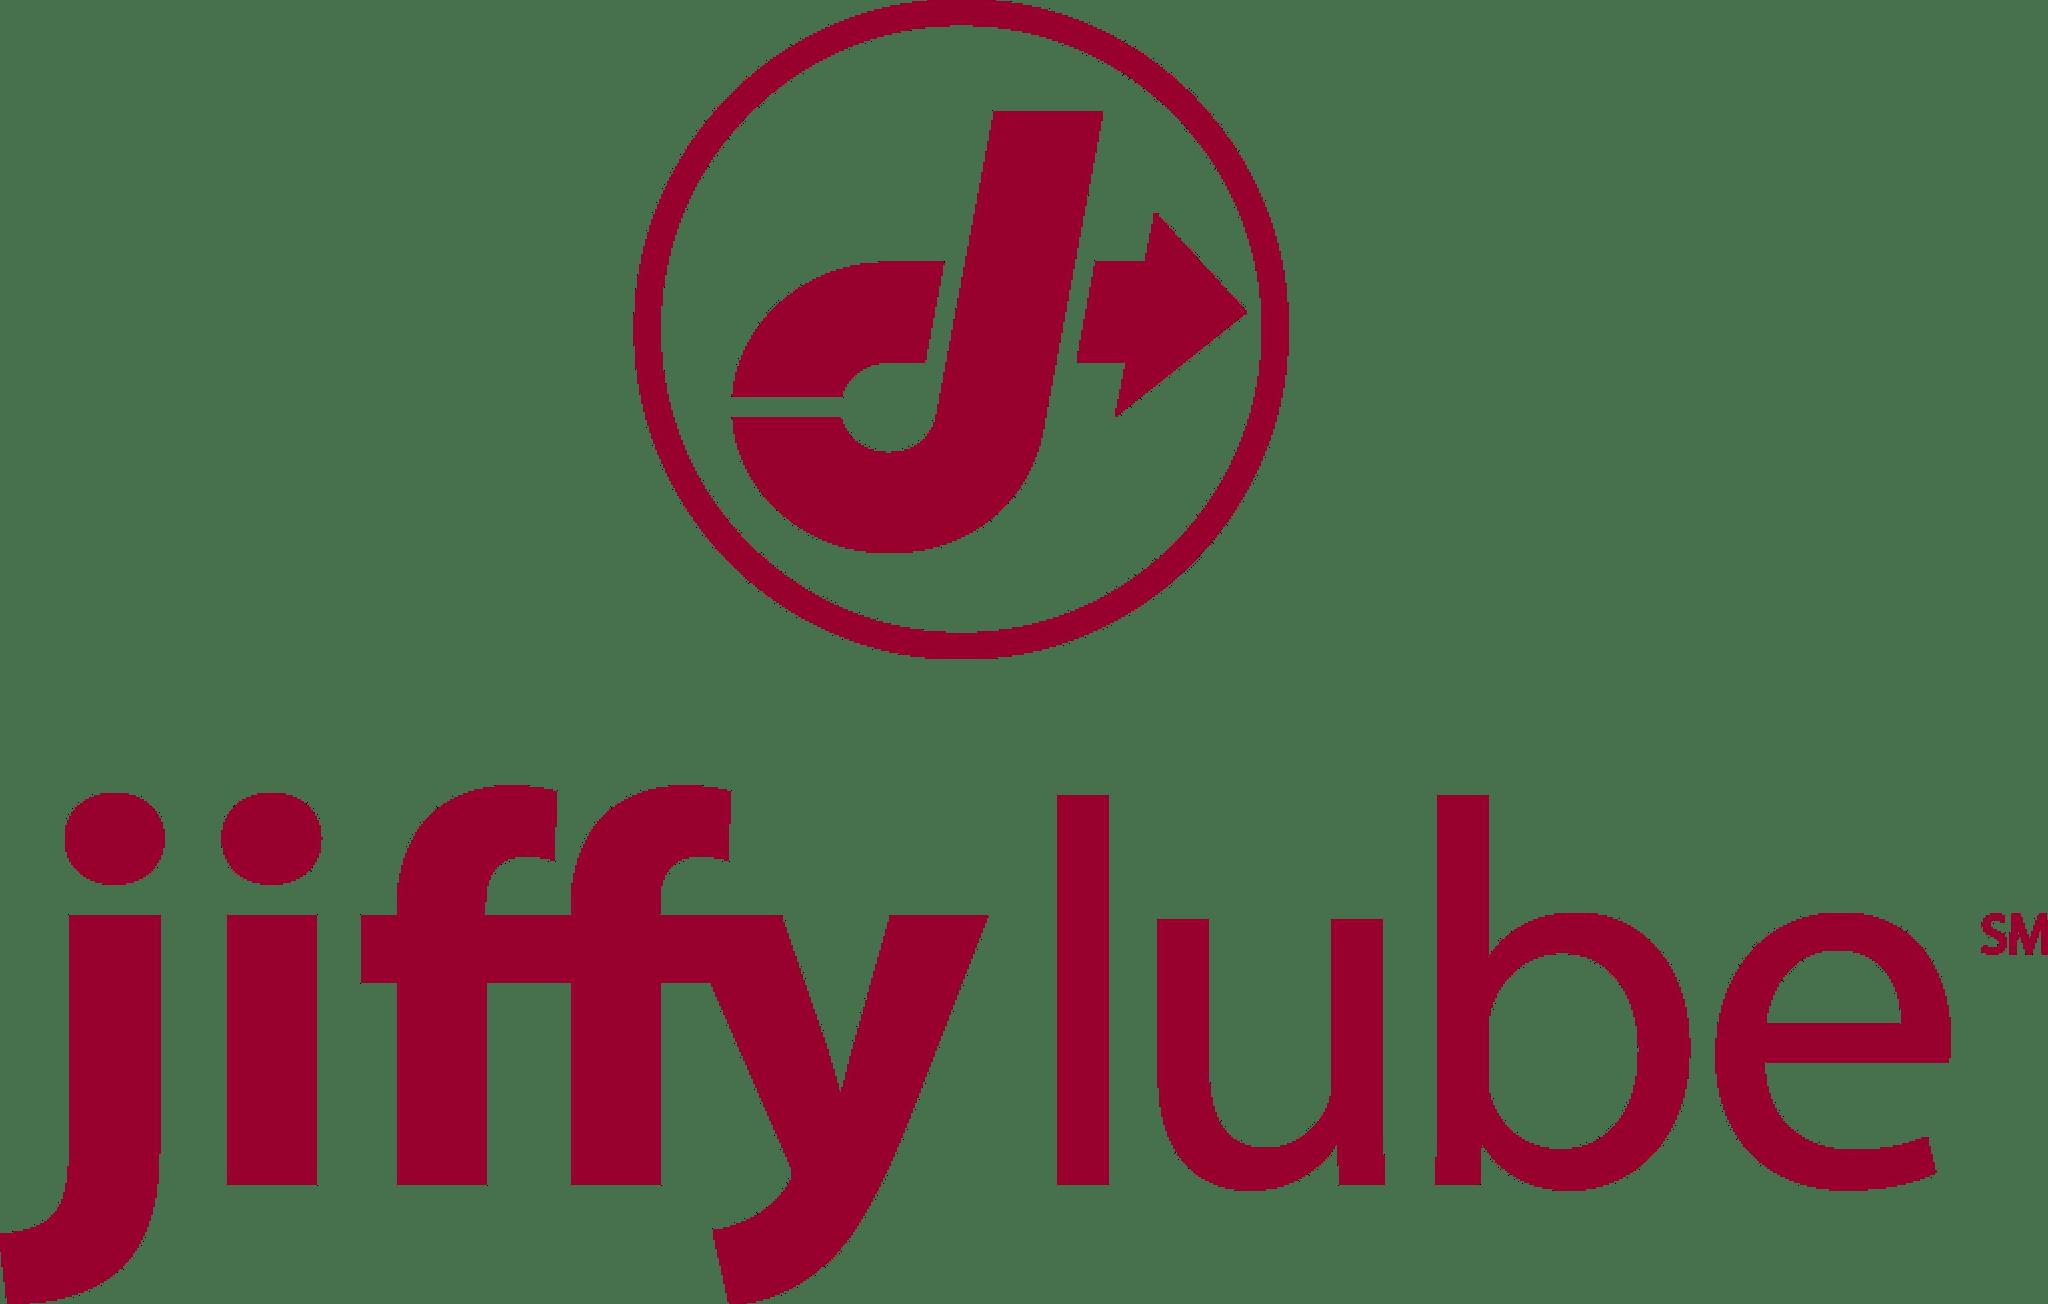 Jiffy Lube®